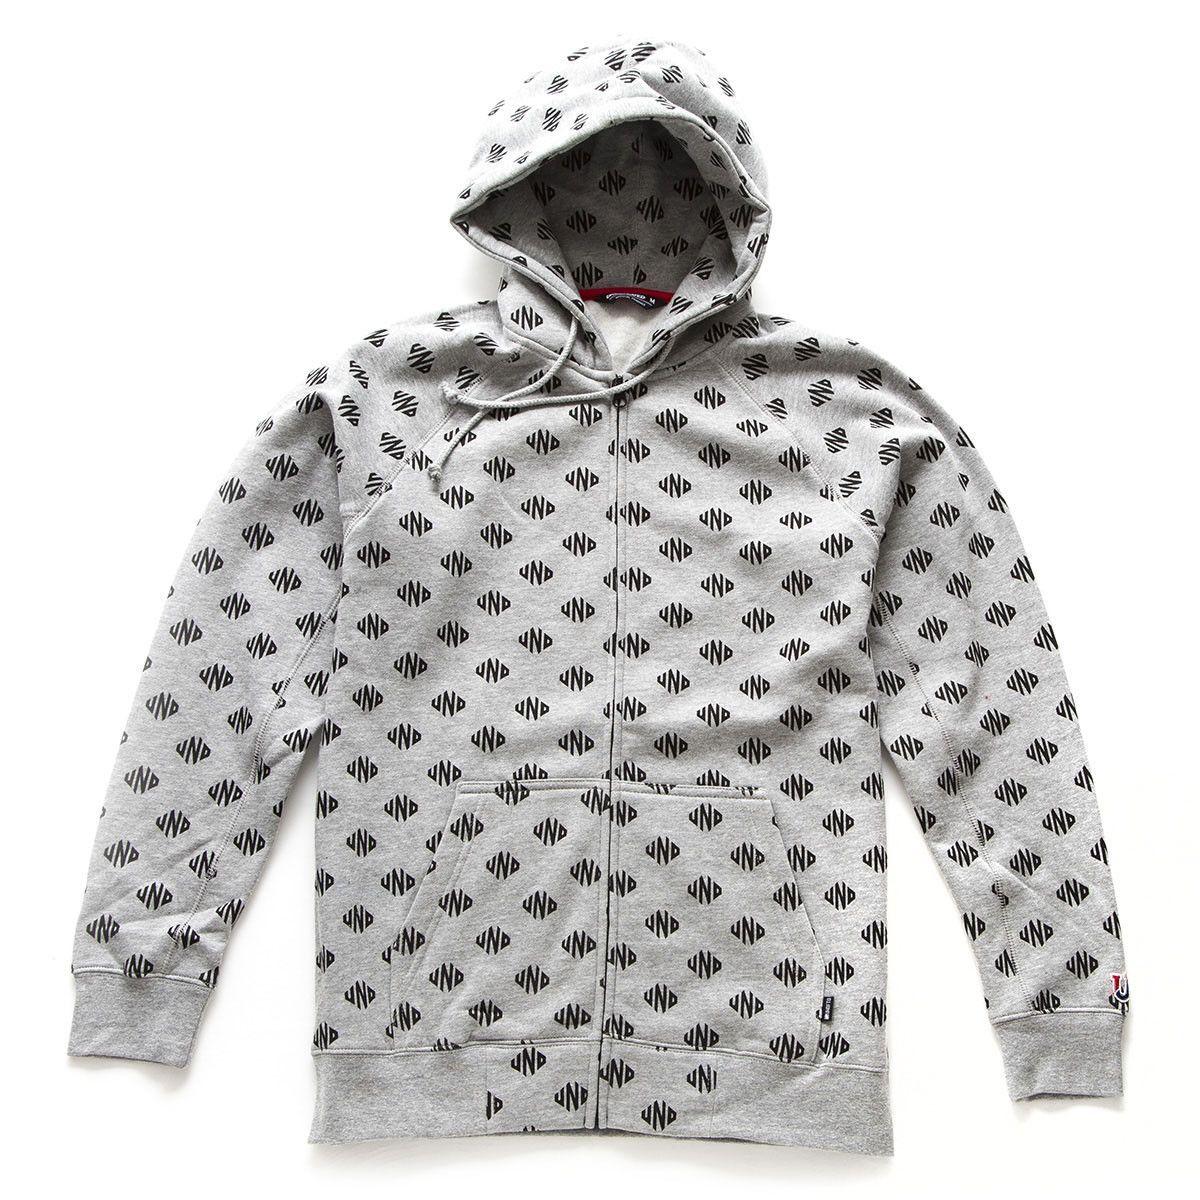 Undefeated: UND Zip Hoodie - Grey Heather | Products | Zip hoodie